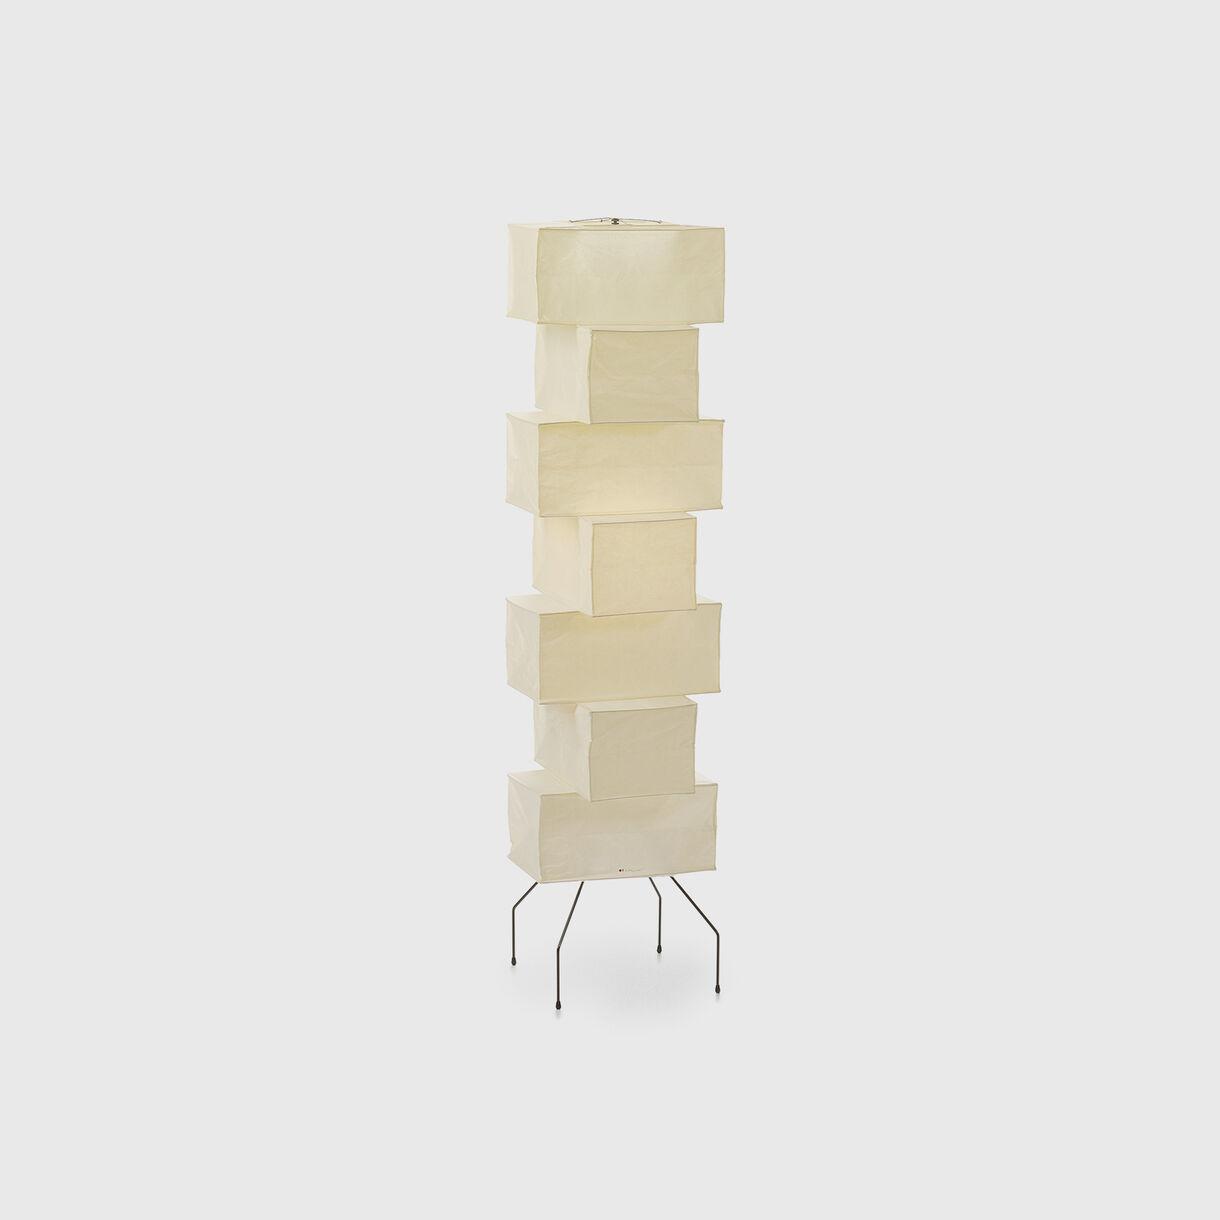 Akari UF4-L10 Floor Lamp